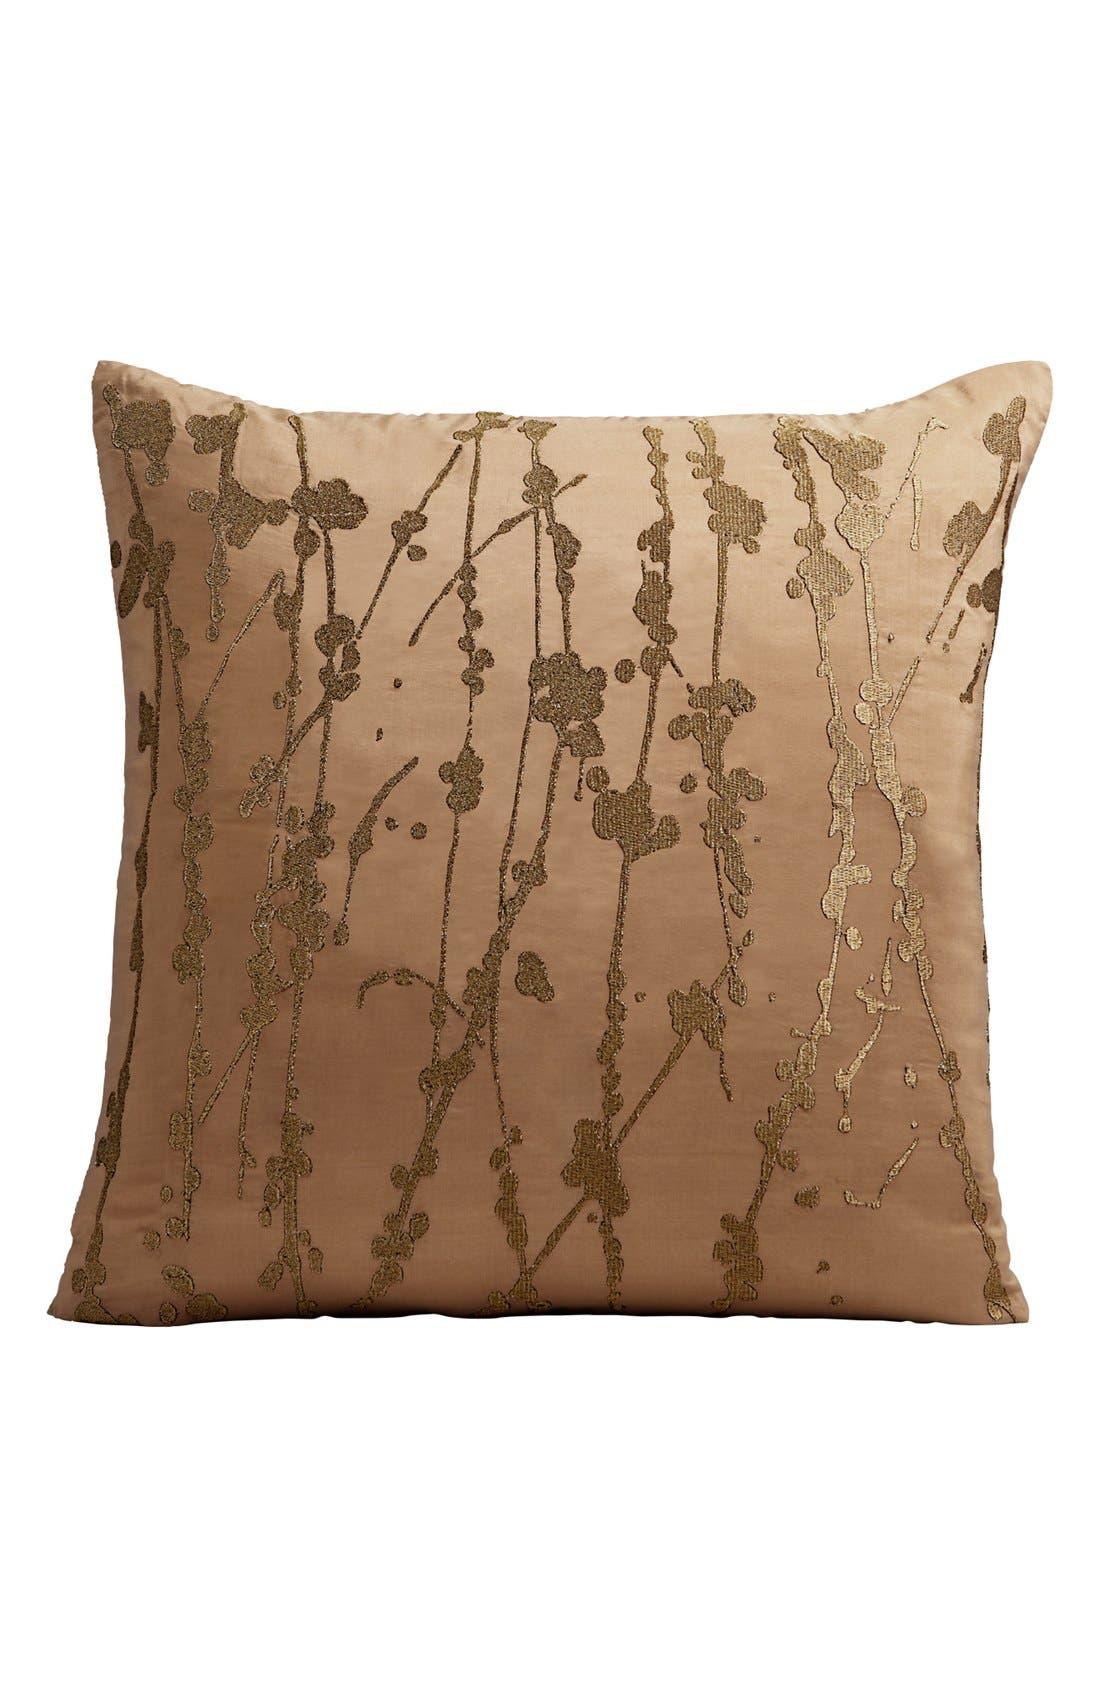 Alternate Image 1 Selected - Donna Karan Metallic Embroidered Pillow